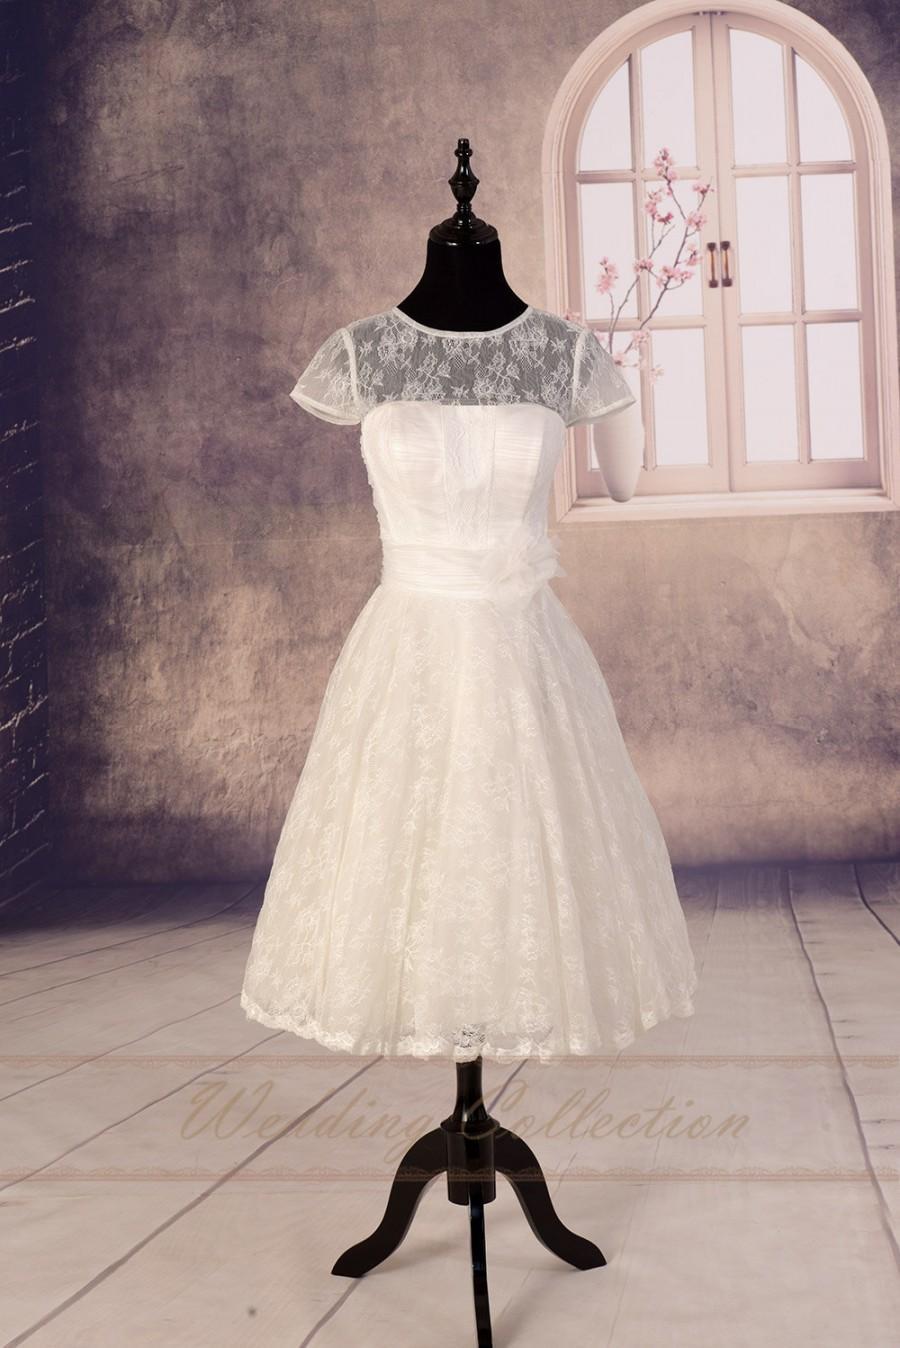 Wedding - Sheer Lace Wedding Dress,Tea Length Wedding Dress, Garden Bridal Dress, Destination Wedding Gown